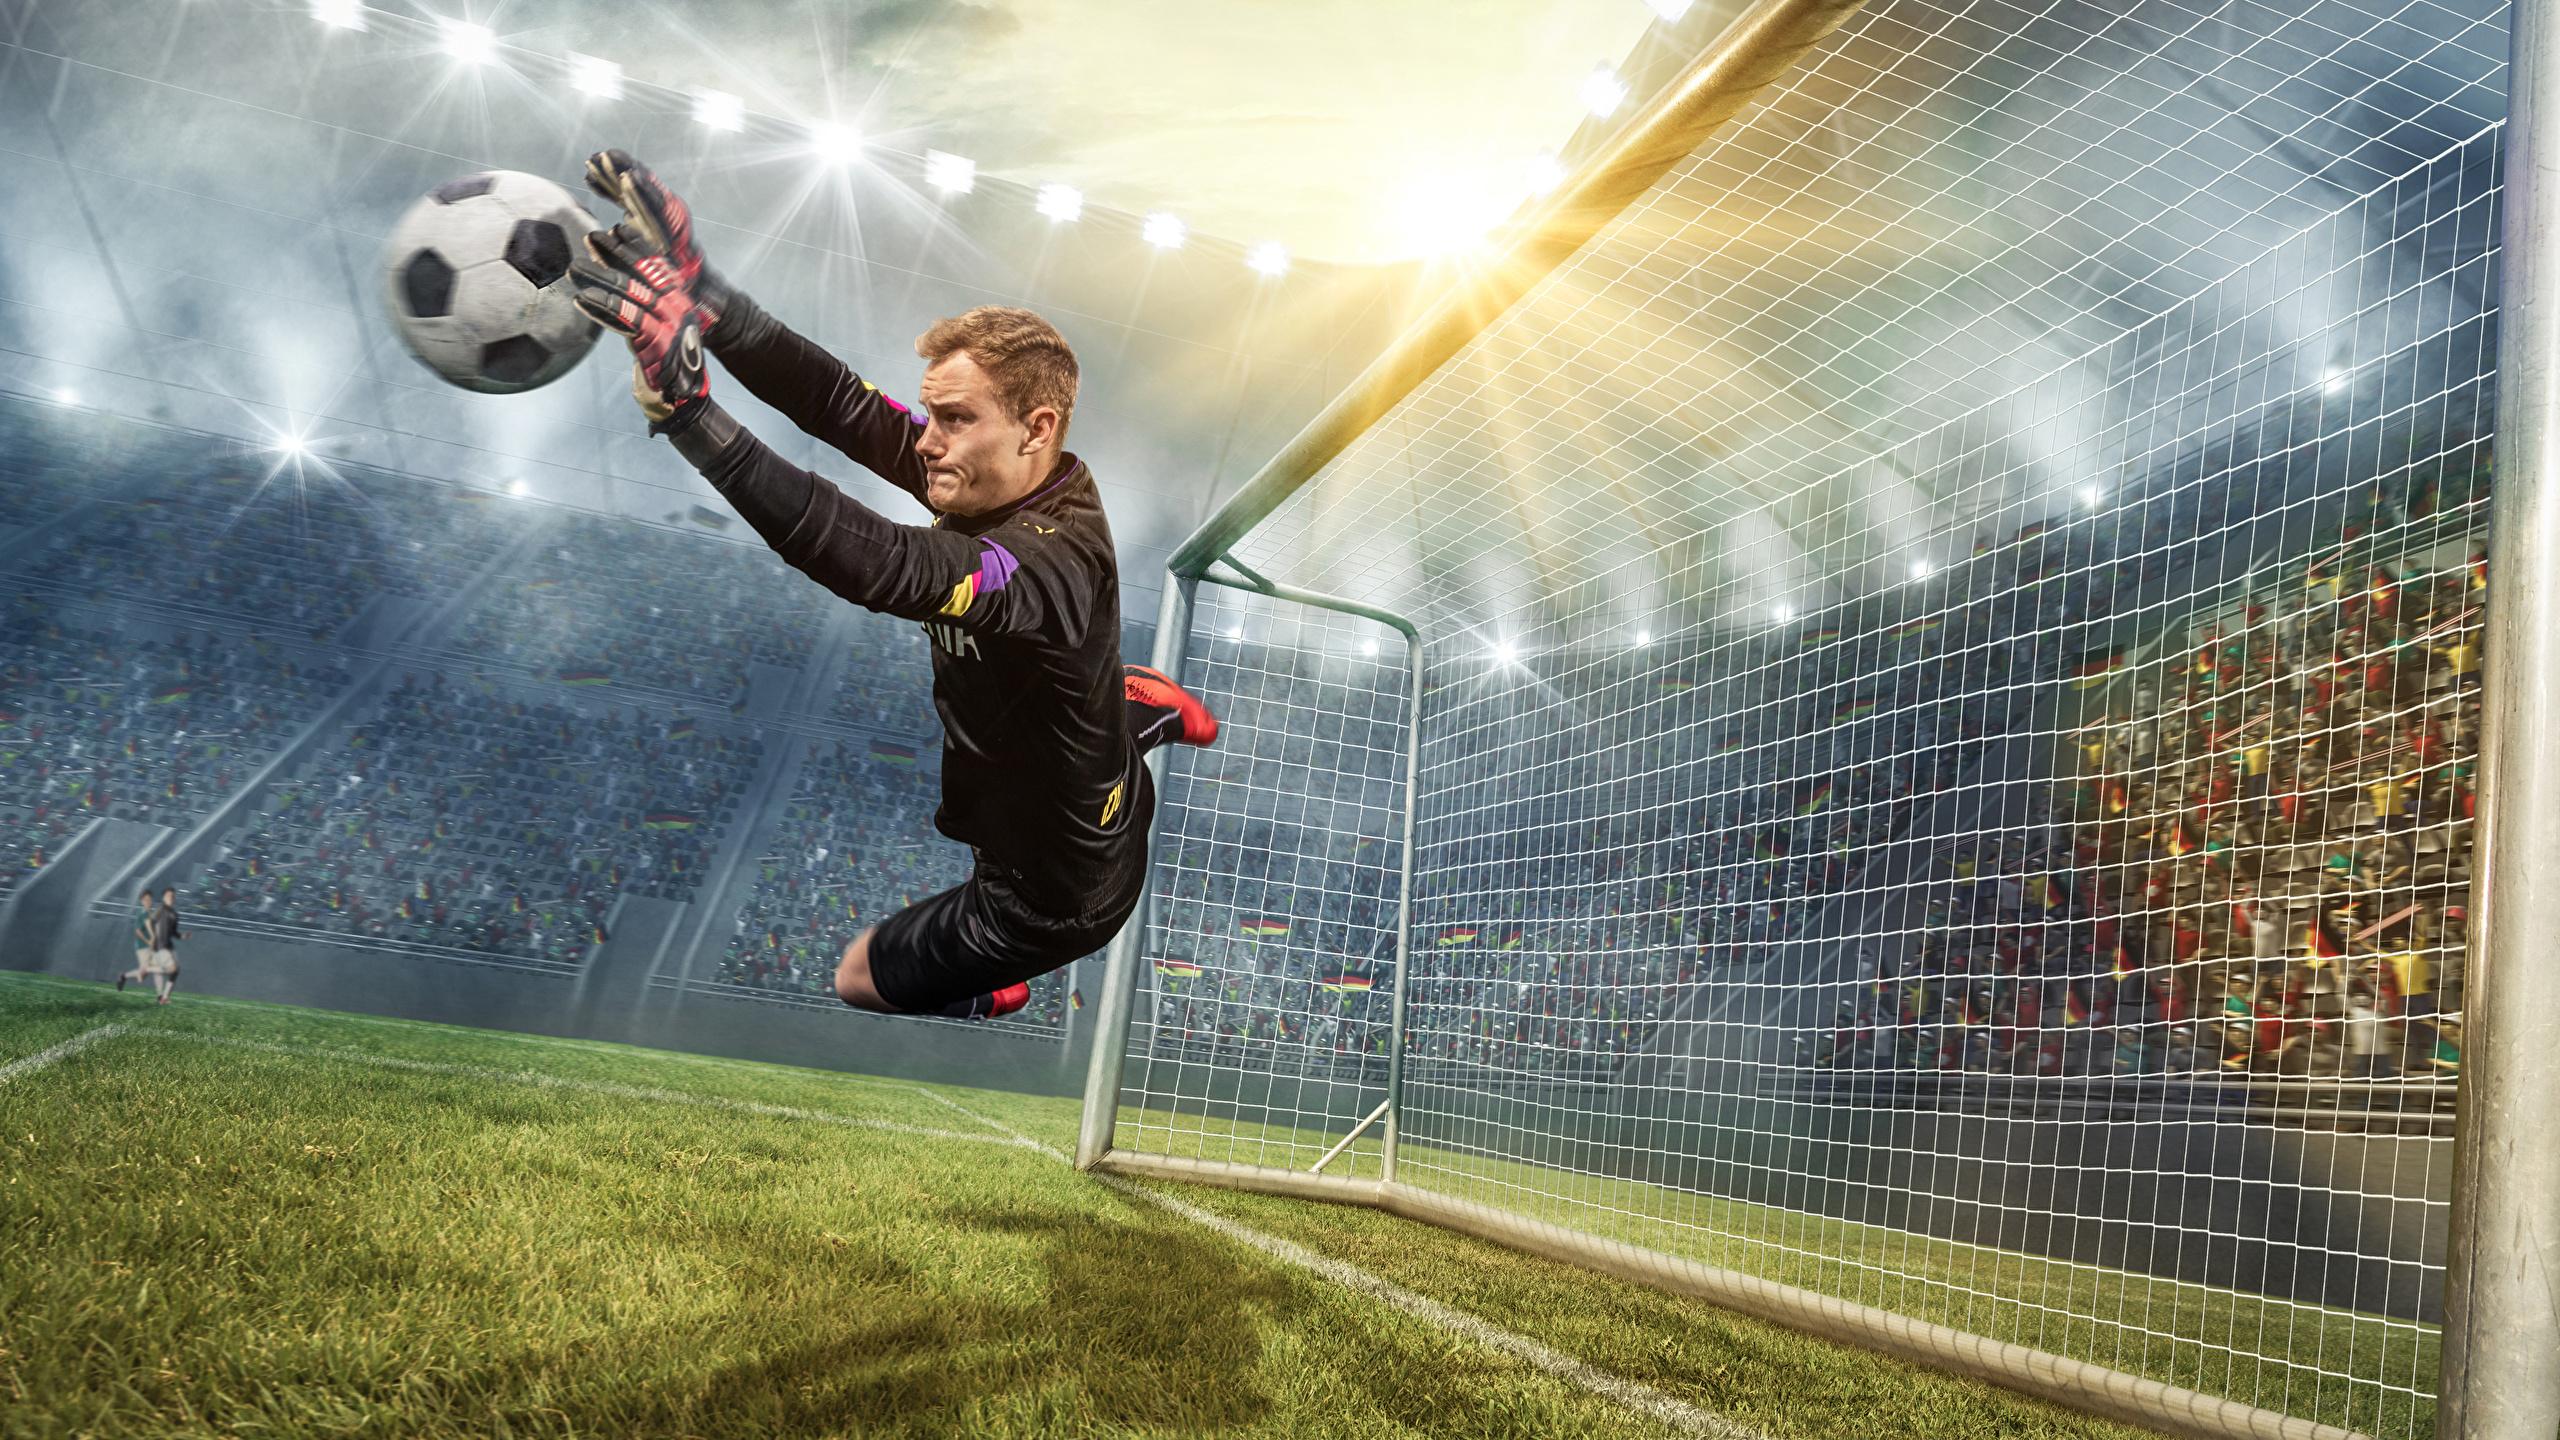 Images Man Goalkeeper football sports Footbal Jump Ball 2560x1440 2560x1440